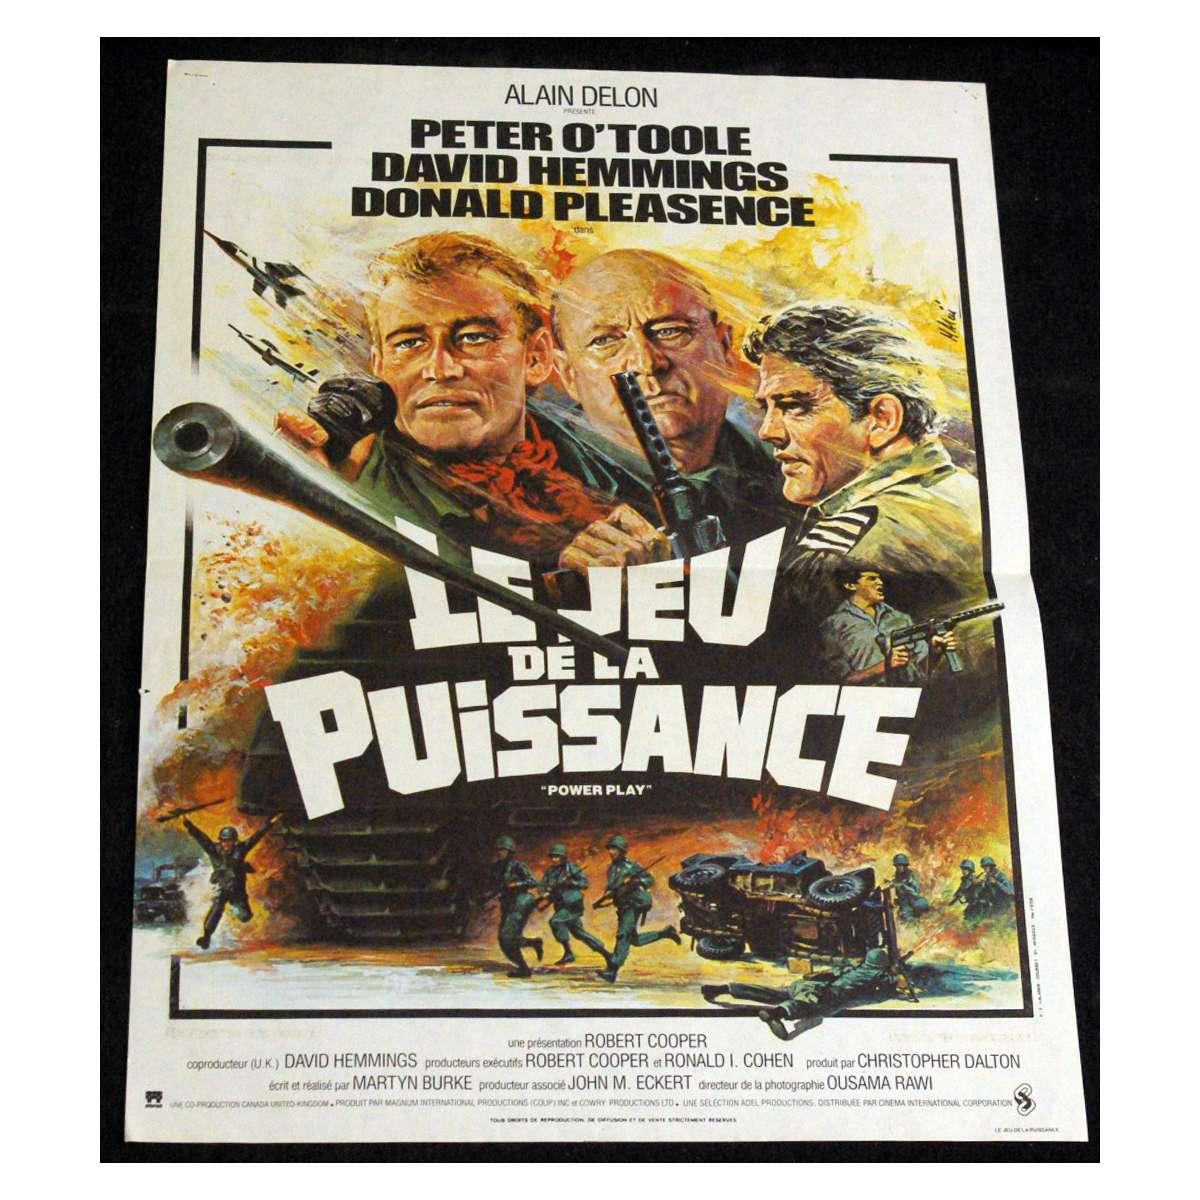 Vintage movie poster for sale